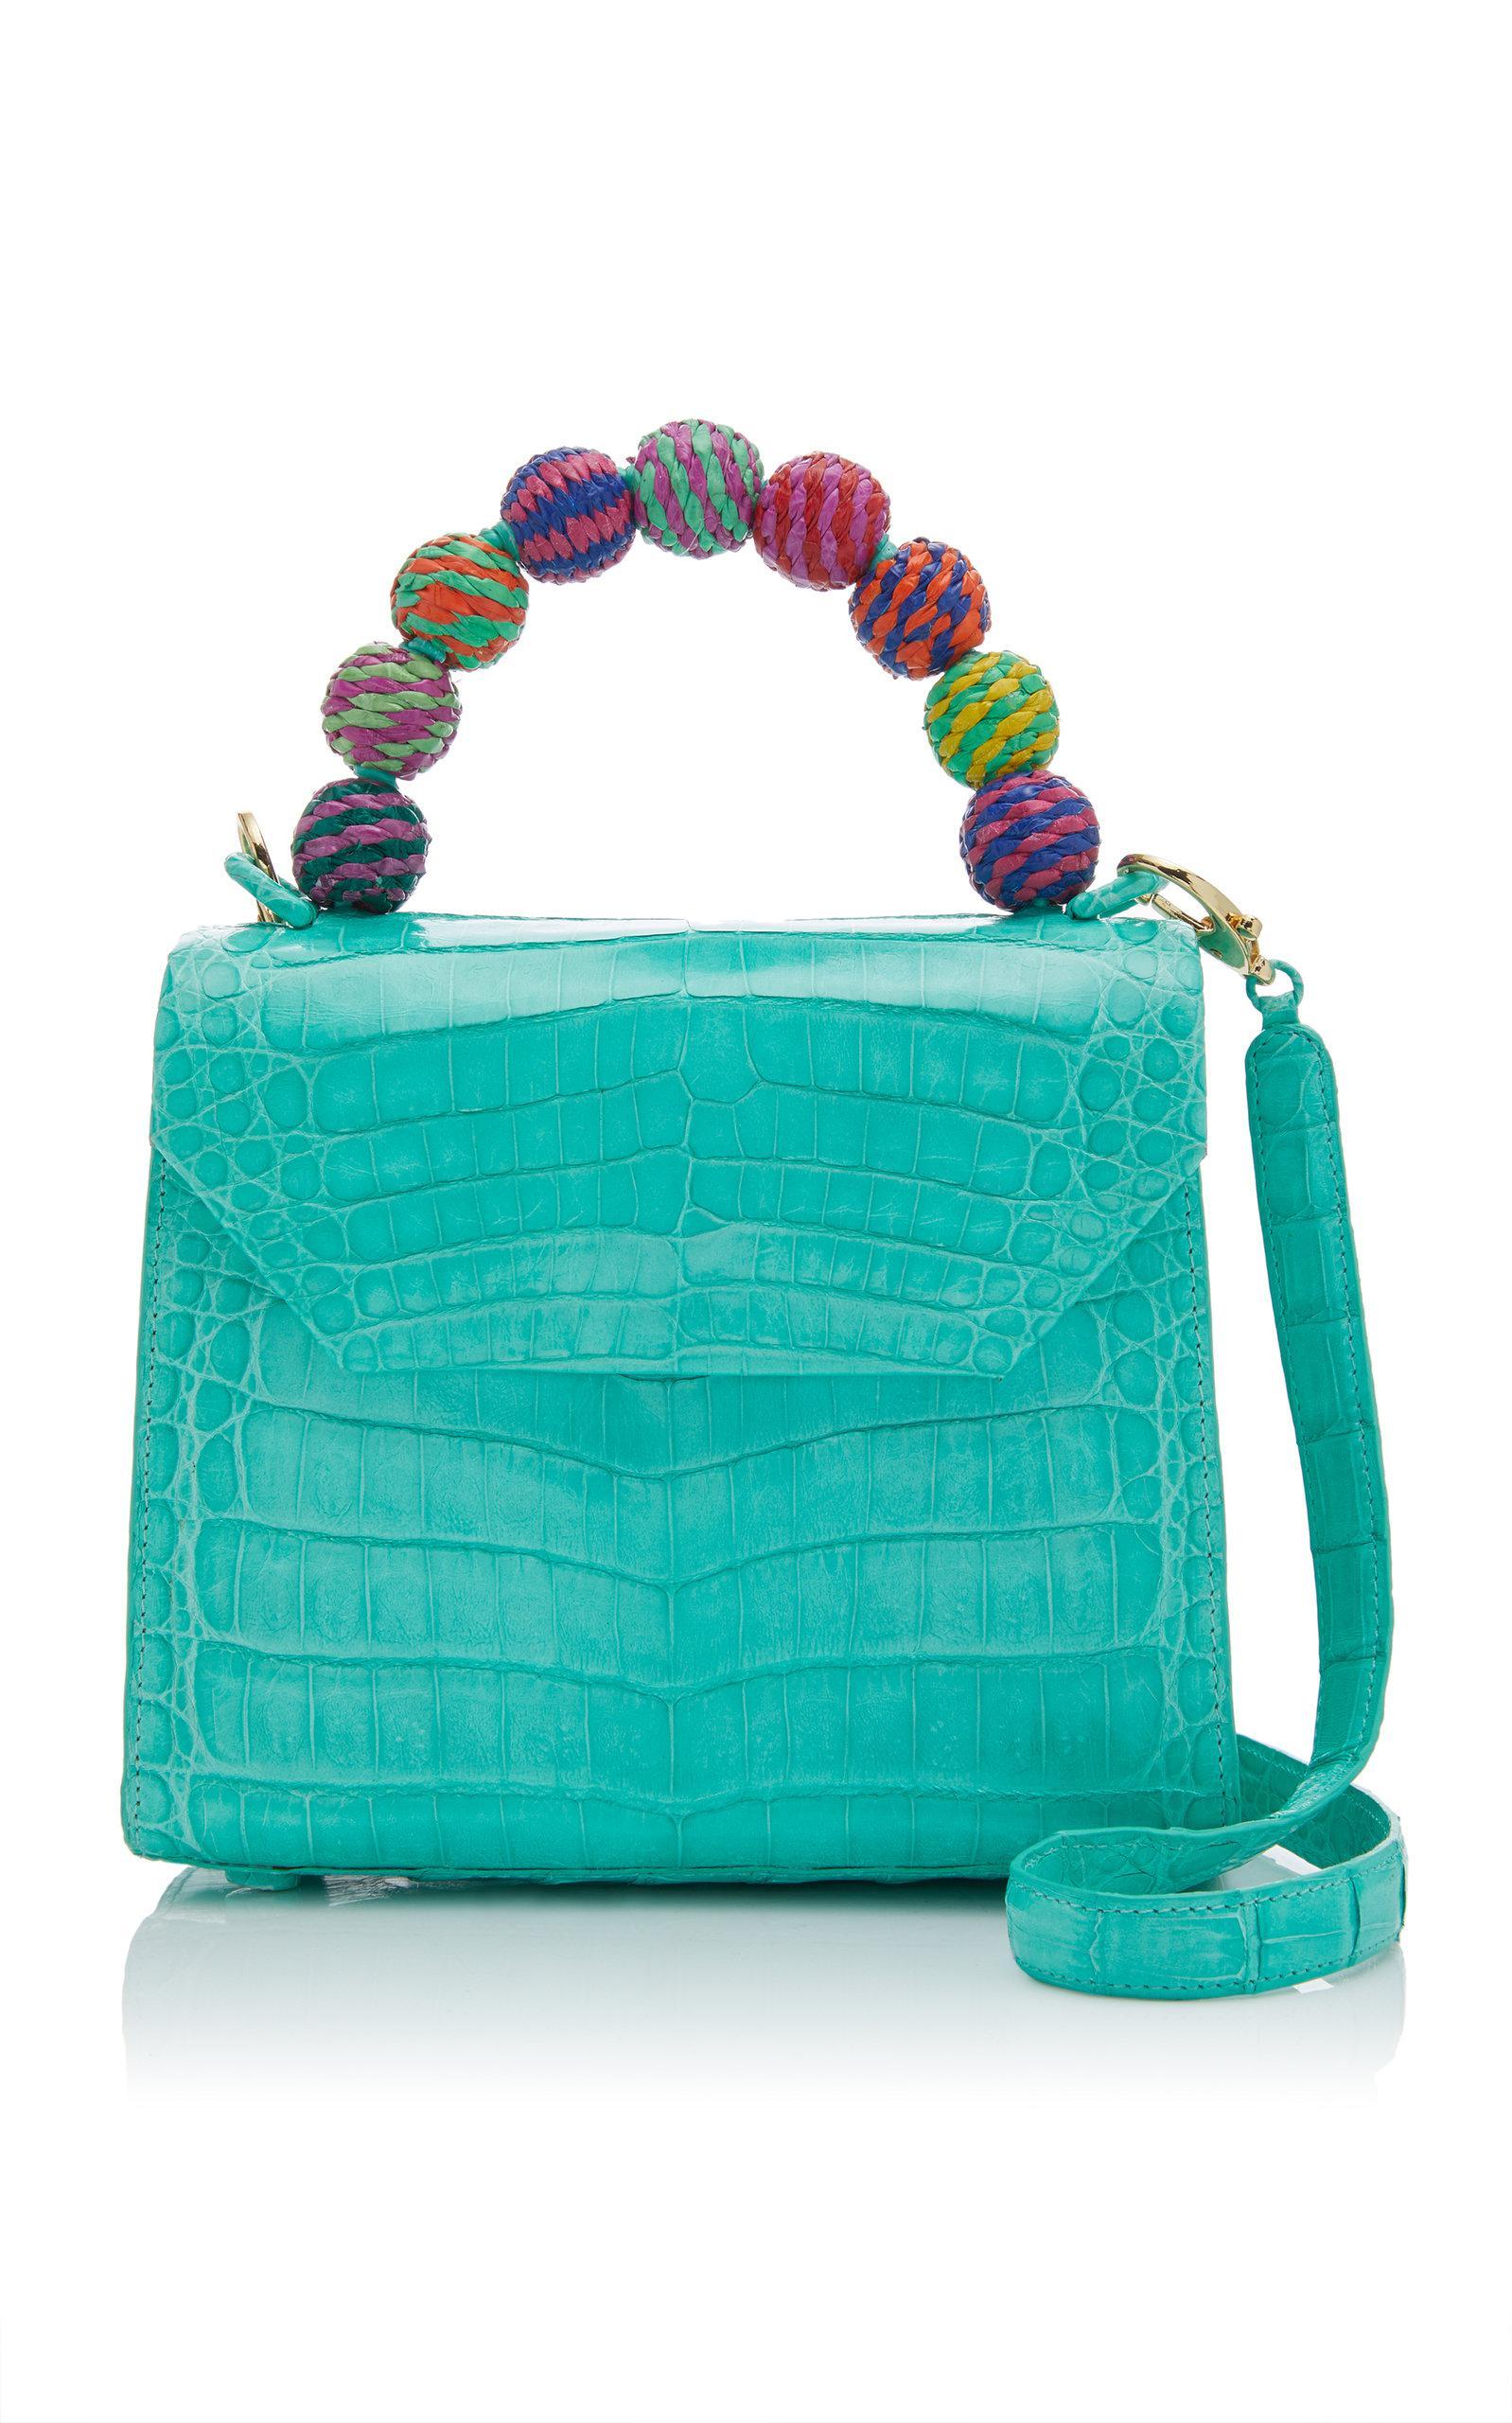 240f3af82ee7 Lyst - Nancy Gonzalez Lily Fiesta Mini Crocodile Top Handle Bag in Blue